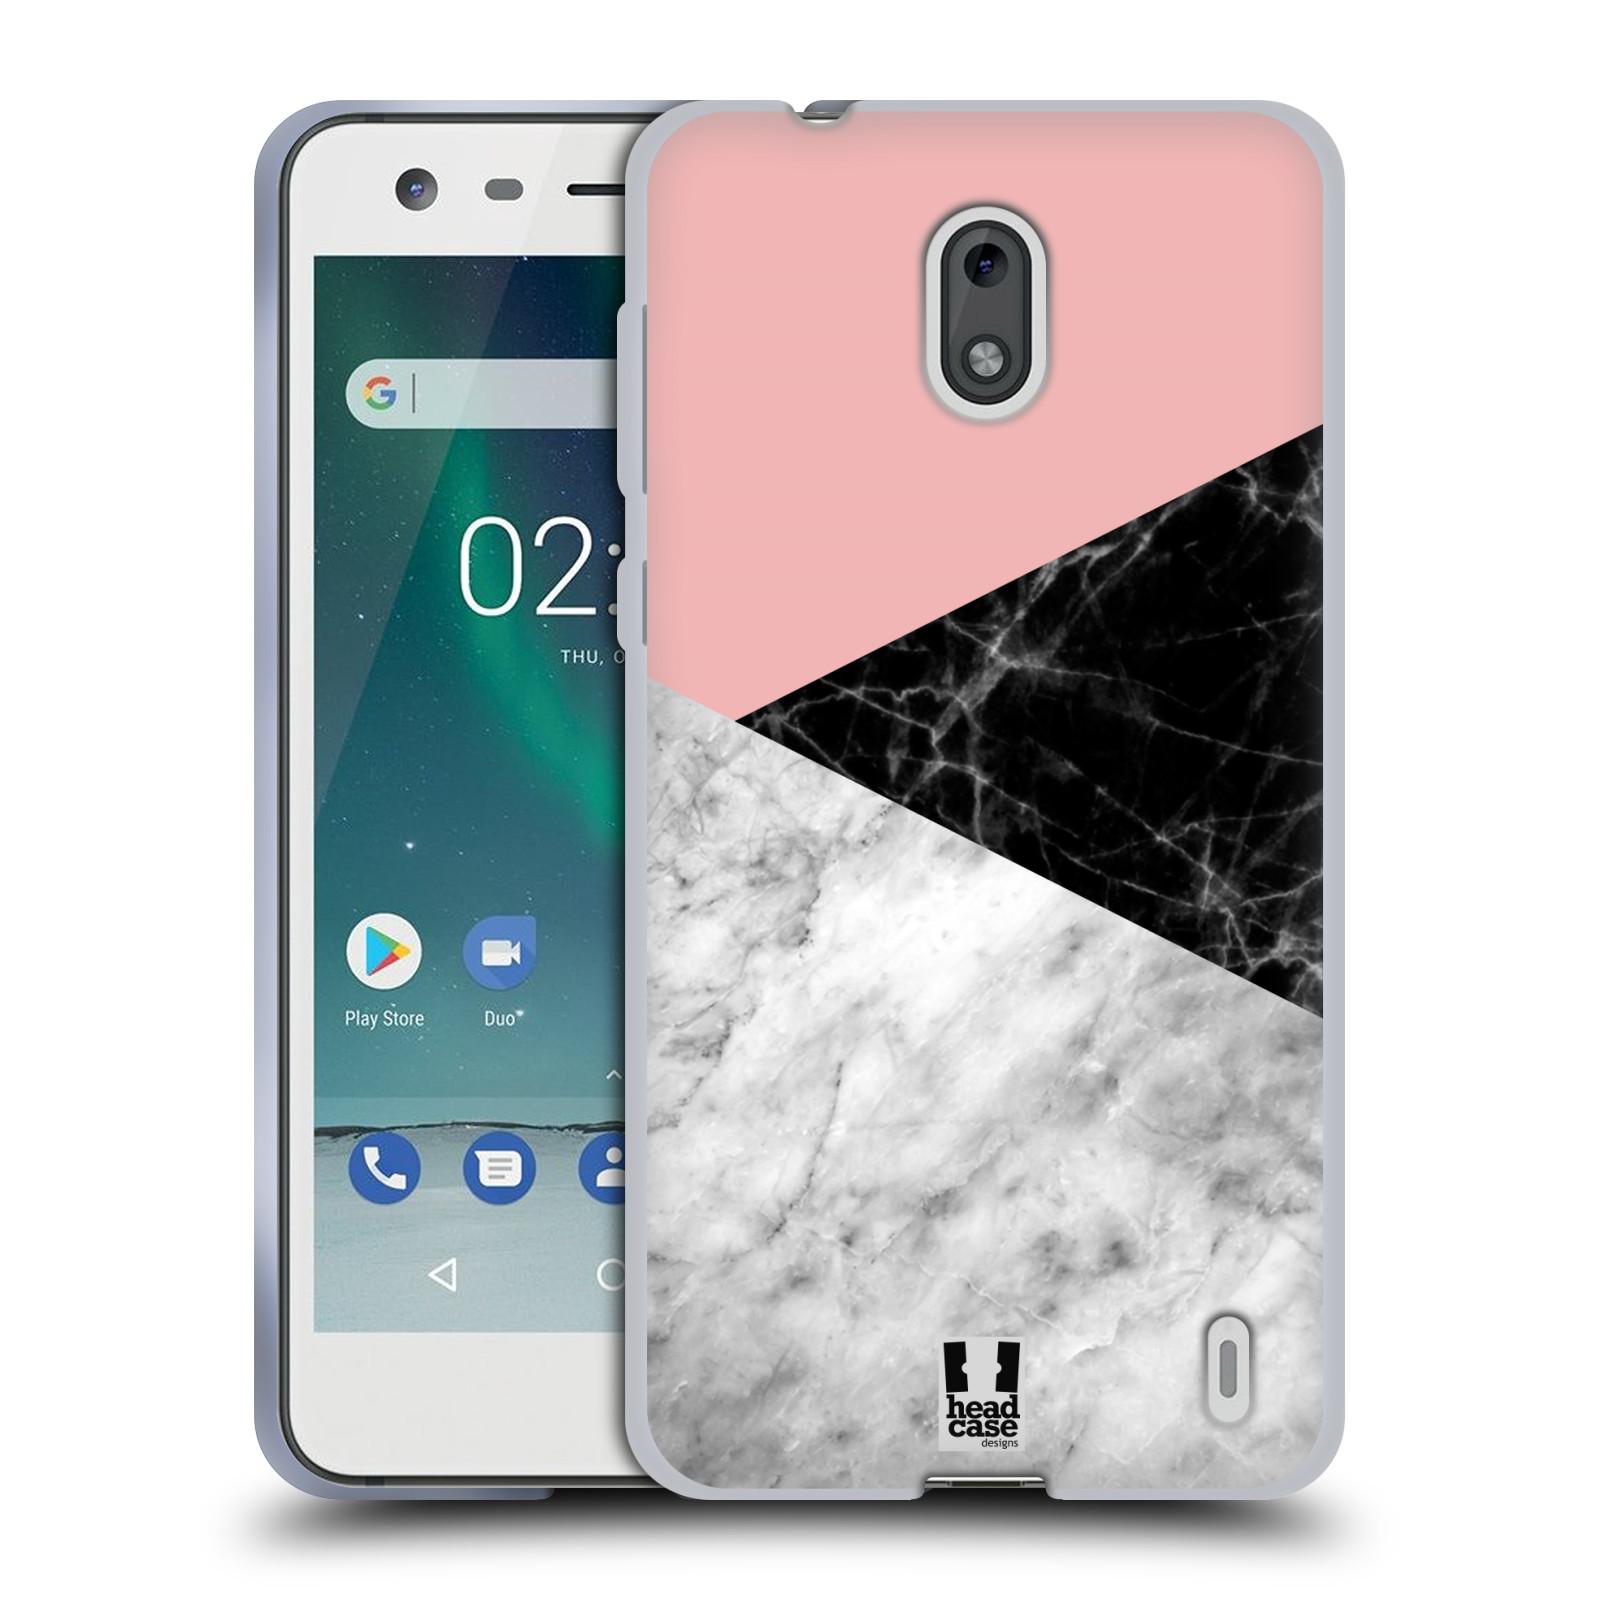 Silikonové pouzdro na mobil Nokia 2 - Head Case - Mramor mix